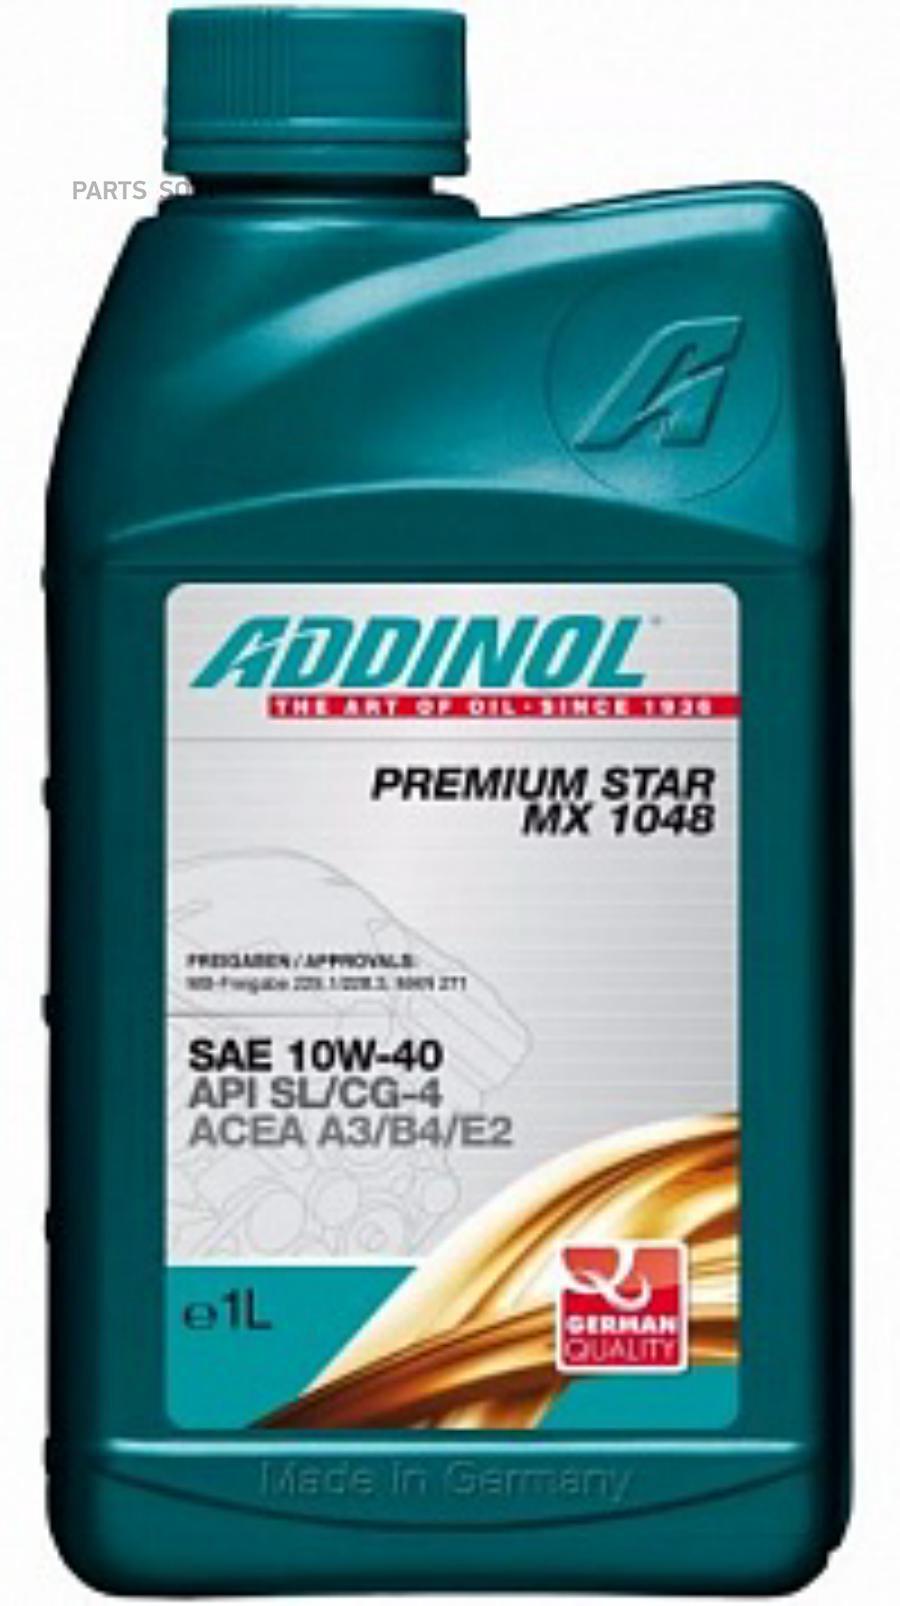 ADDINOL Premium Star MX 1048